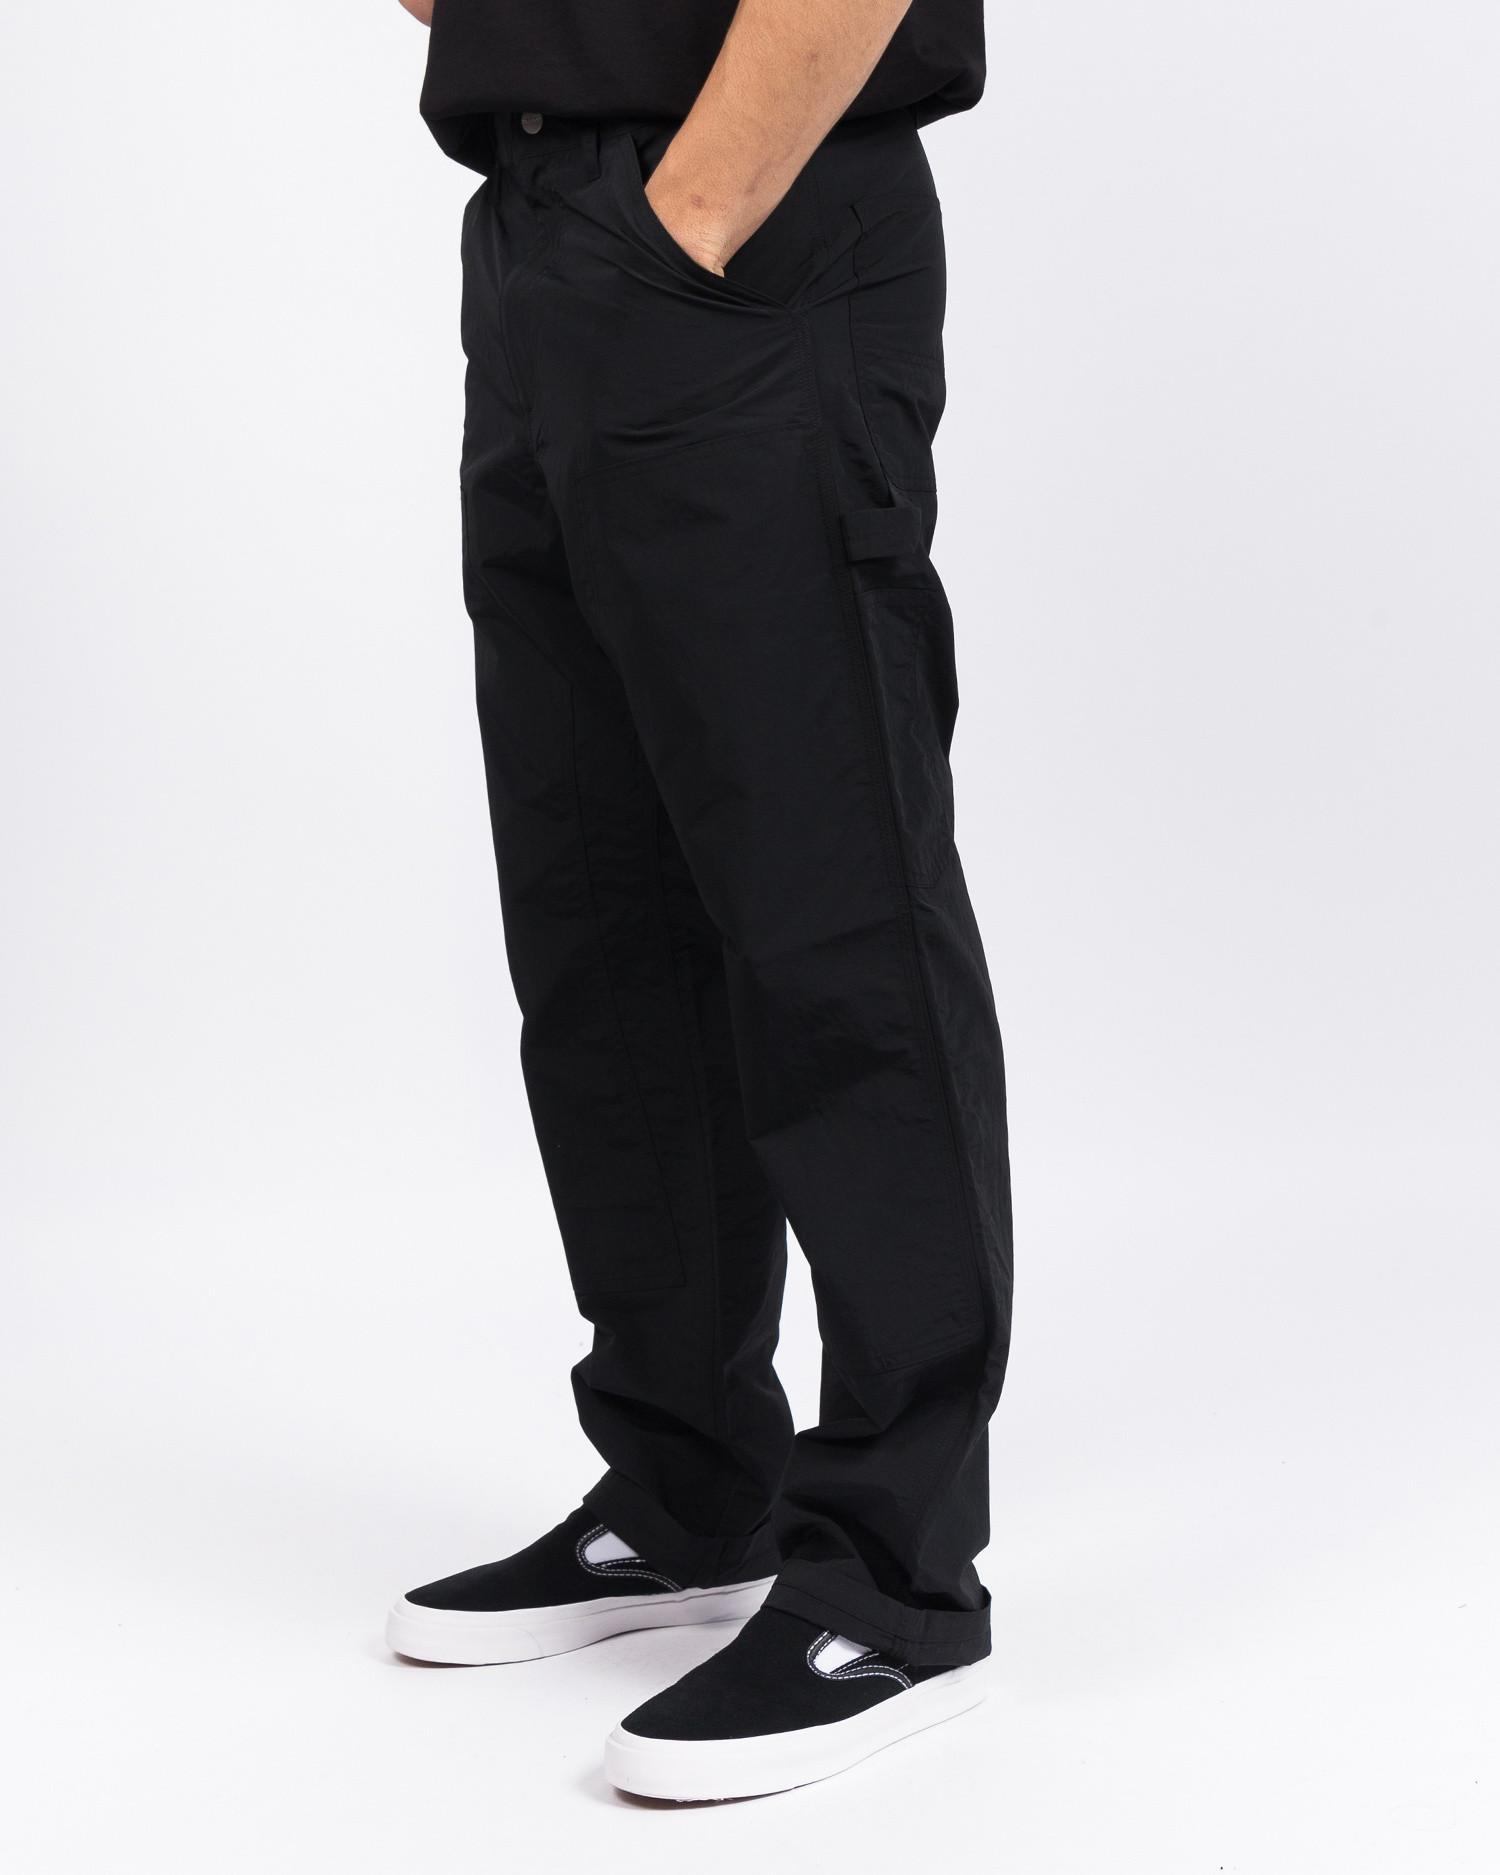 Carhartt x Pop Trading Co Double Knee Pant Black